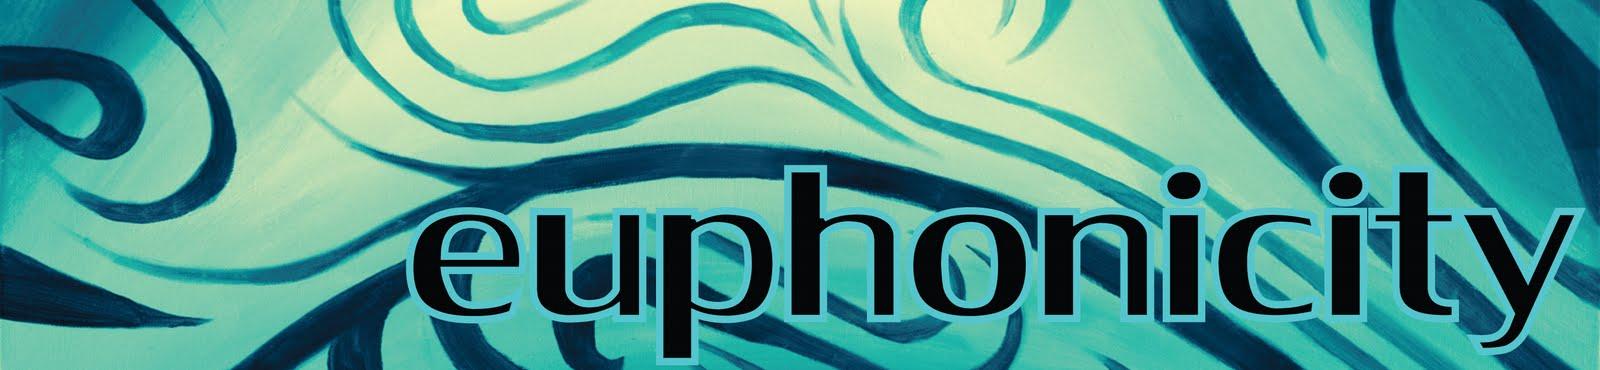 Euphonicity